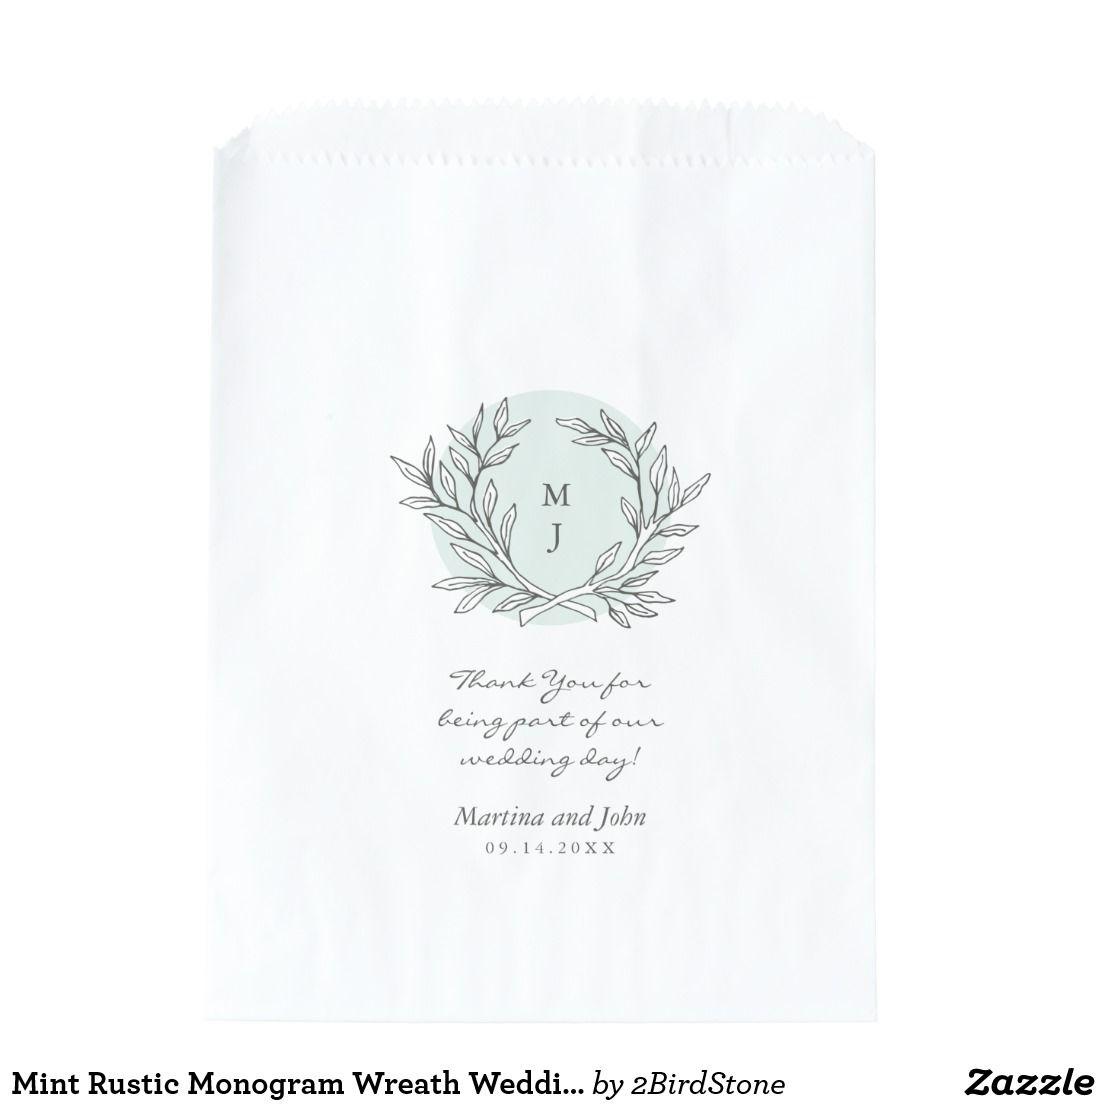 Mint Rustic Monogram Wreath Wedding Favor Bag | Wedding favor bags ...